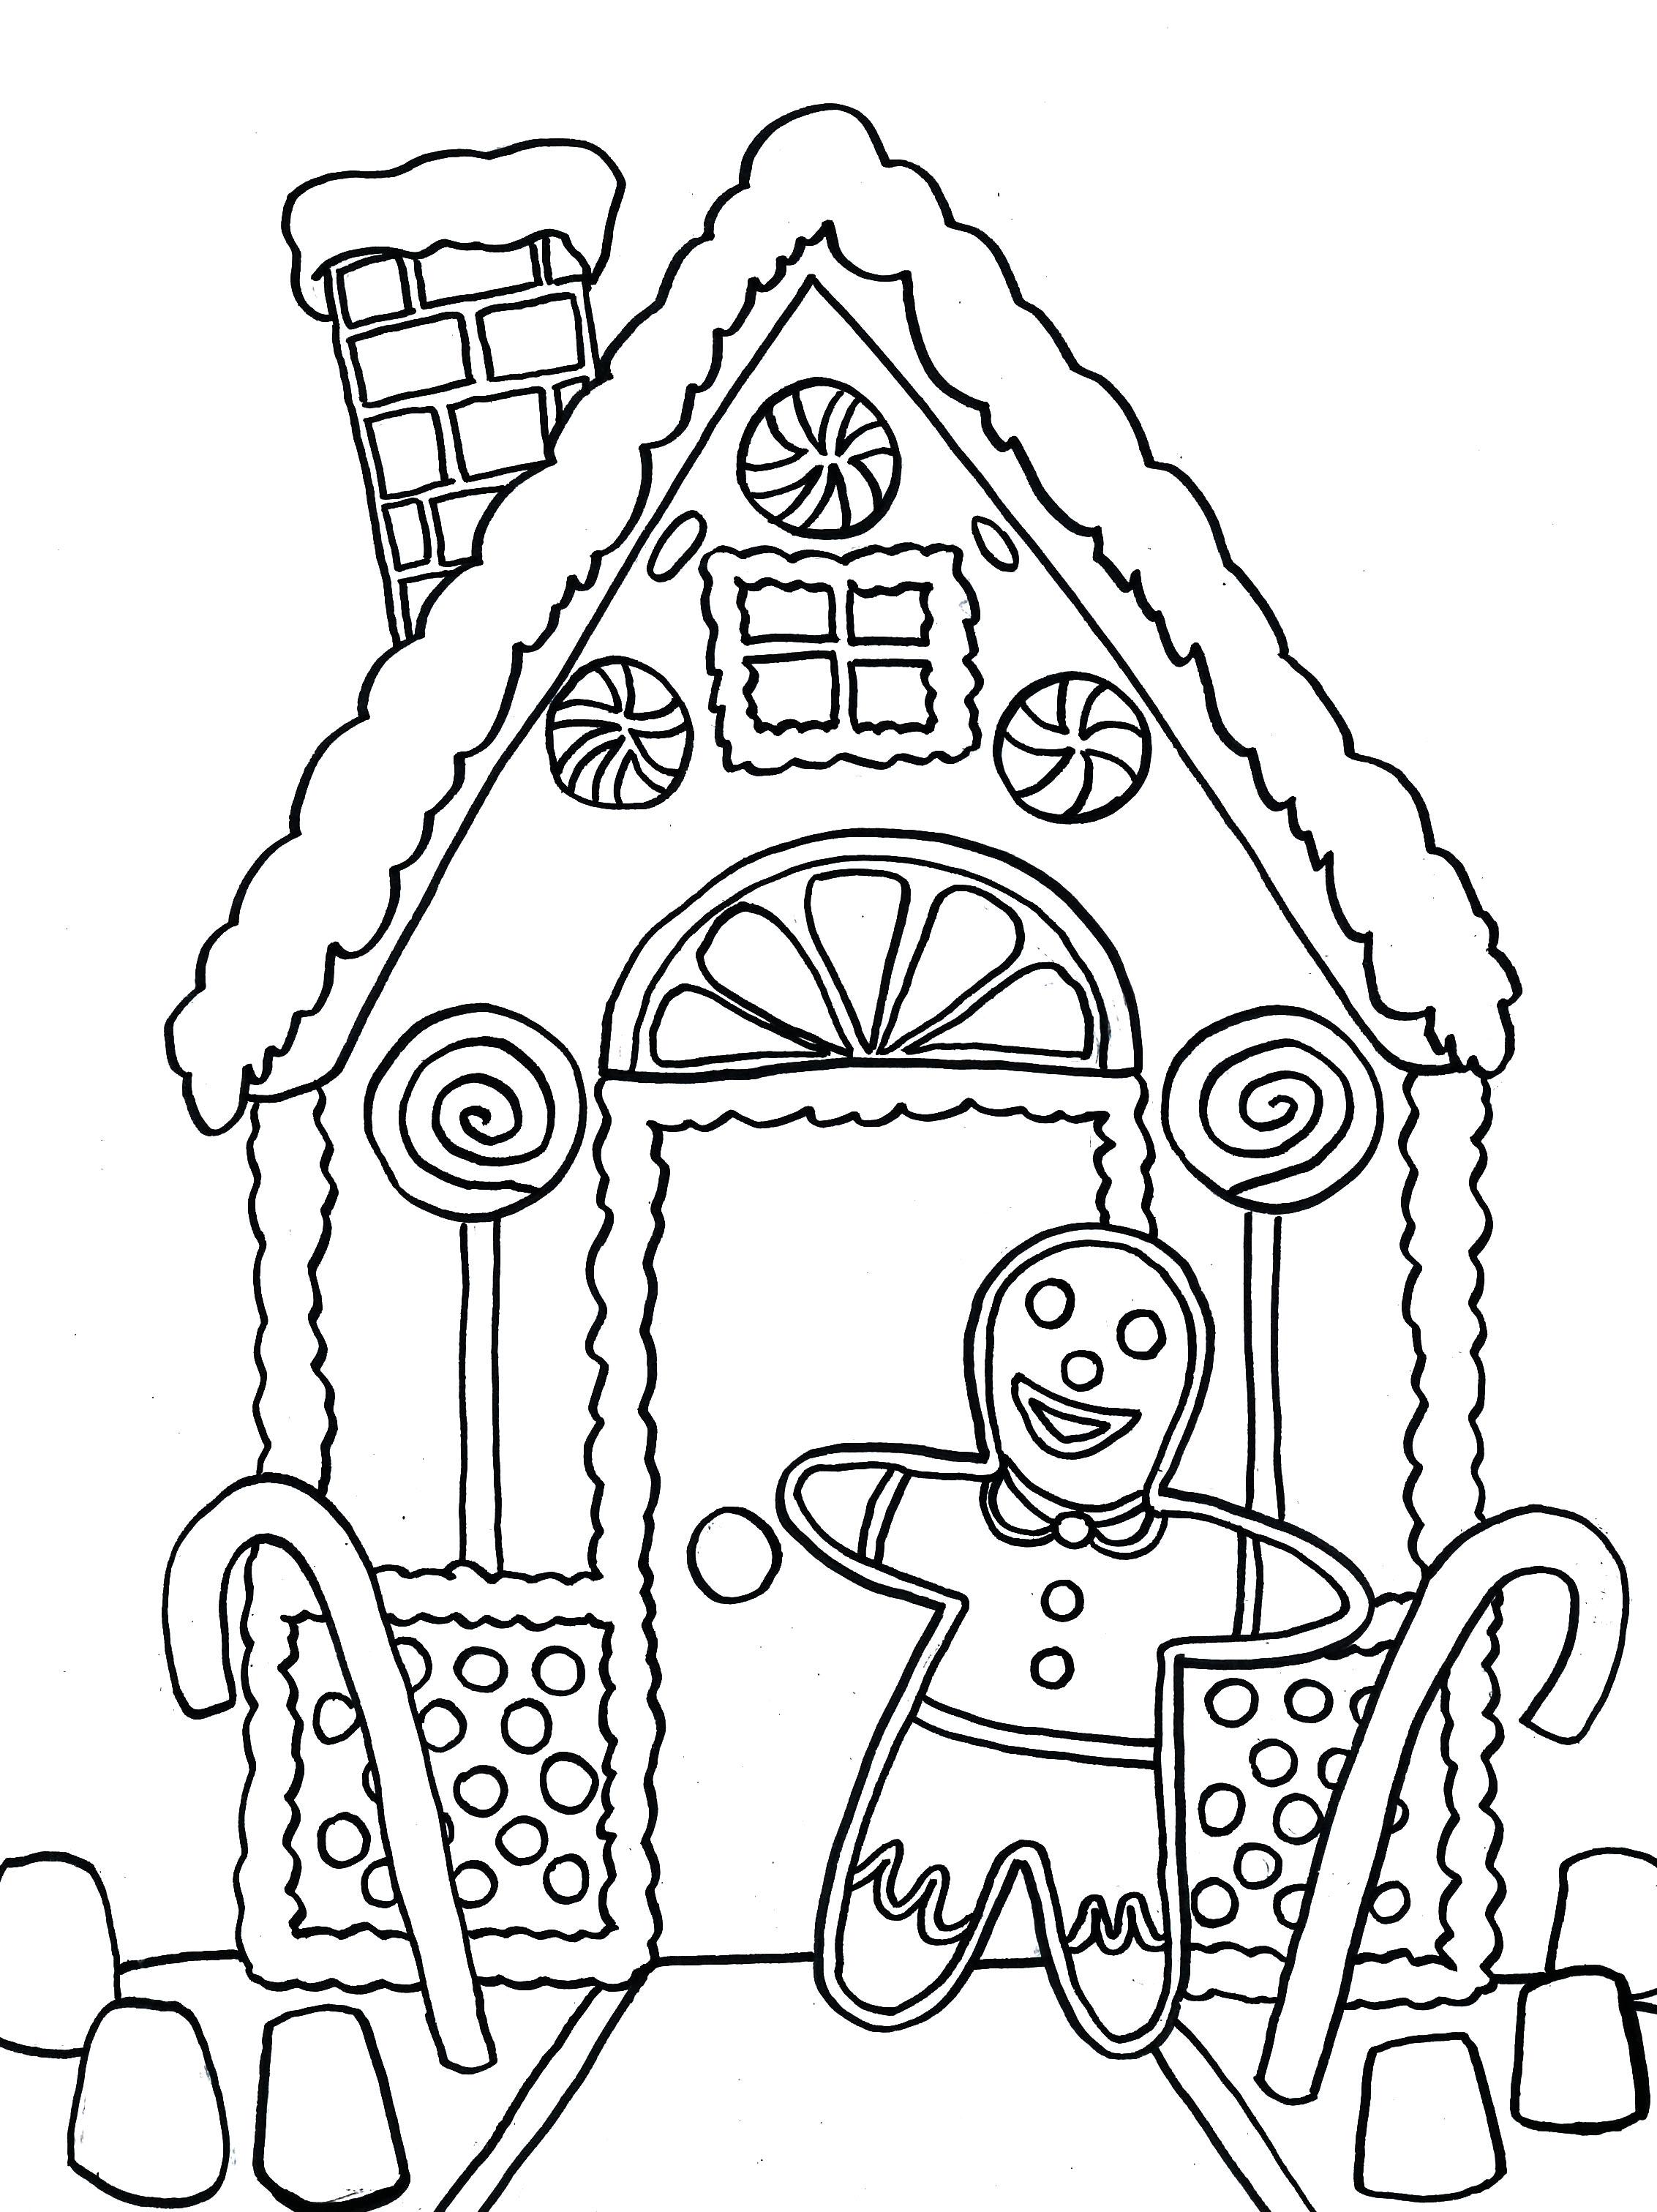 Gingerbread_BW 1.jpg